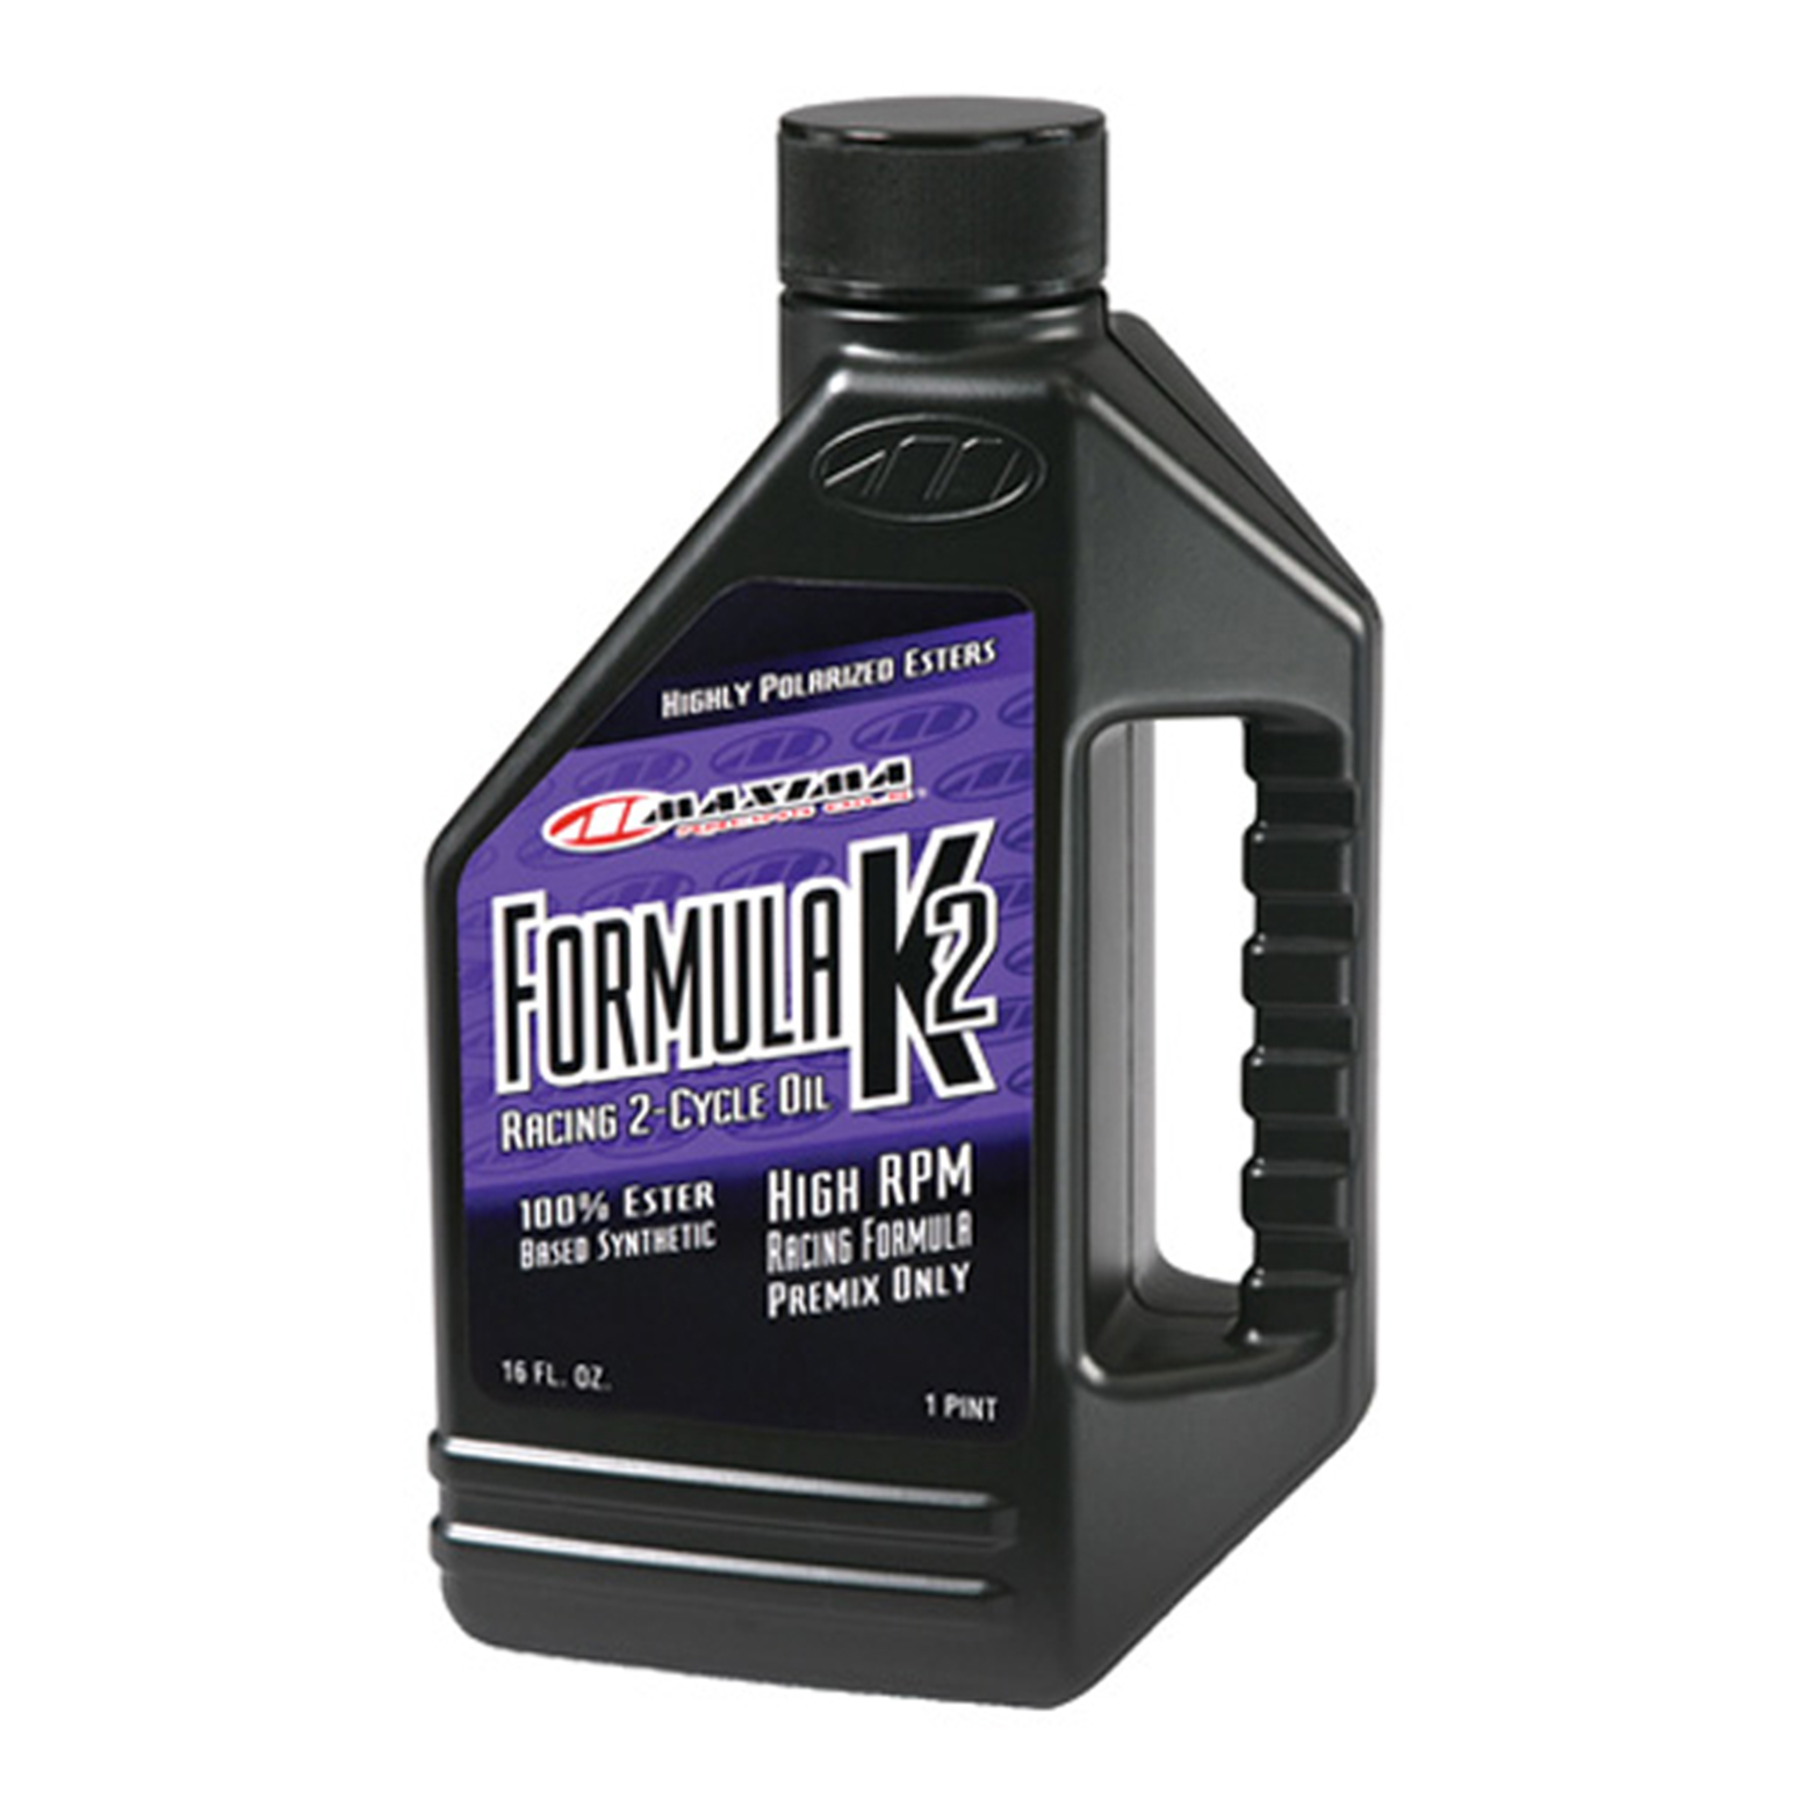 FORMULA K2 100% SYNTHETIC RACING PREMIX (16 OZ)